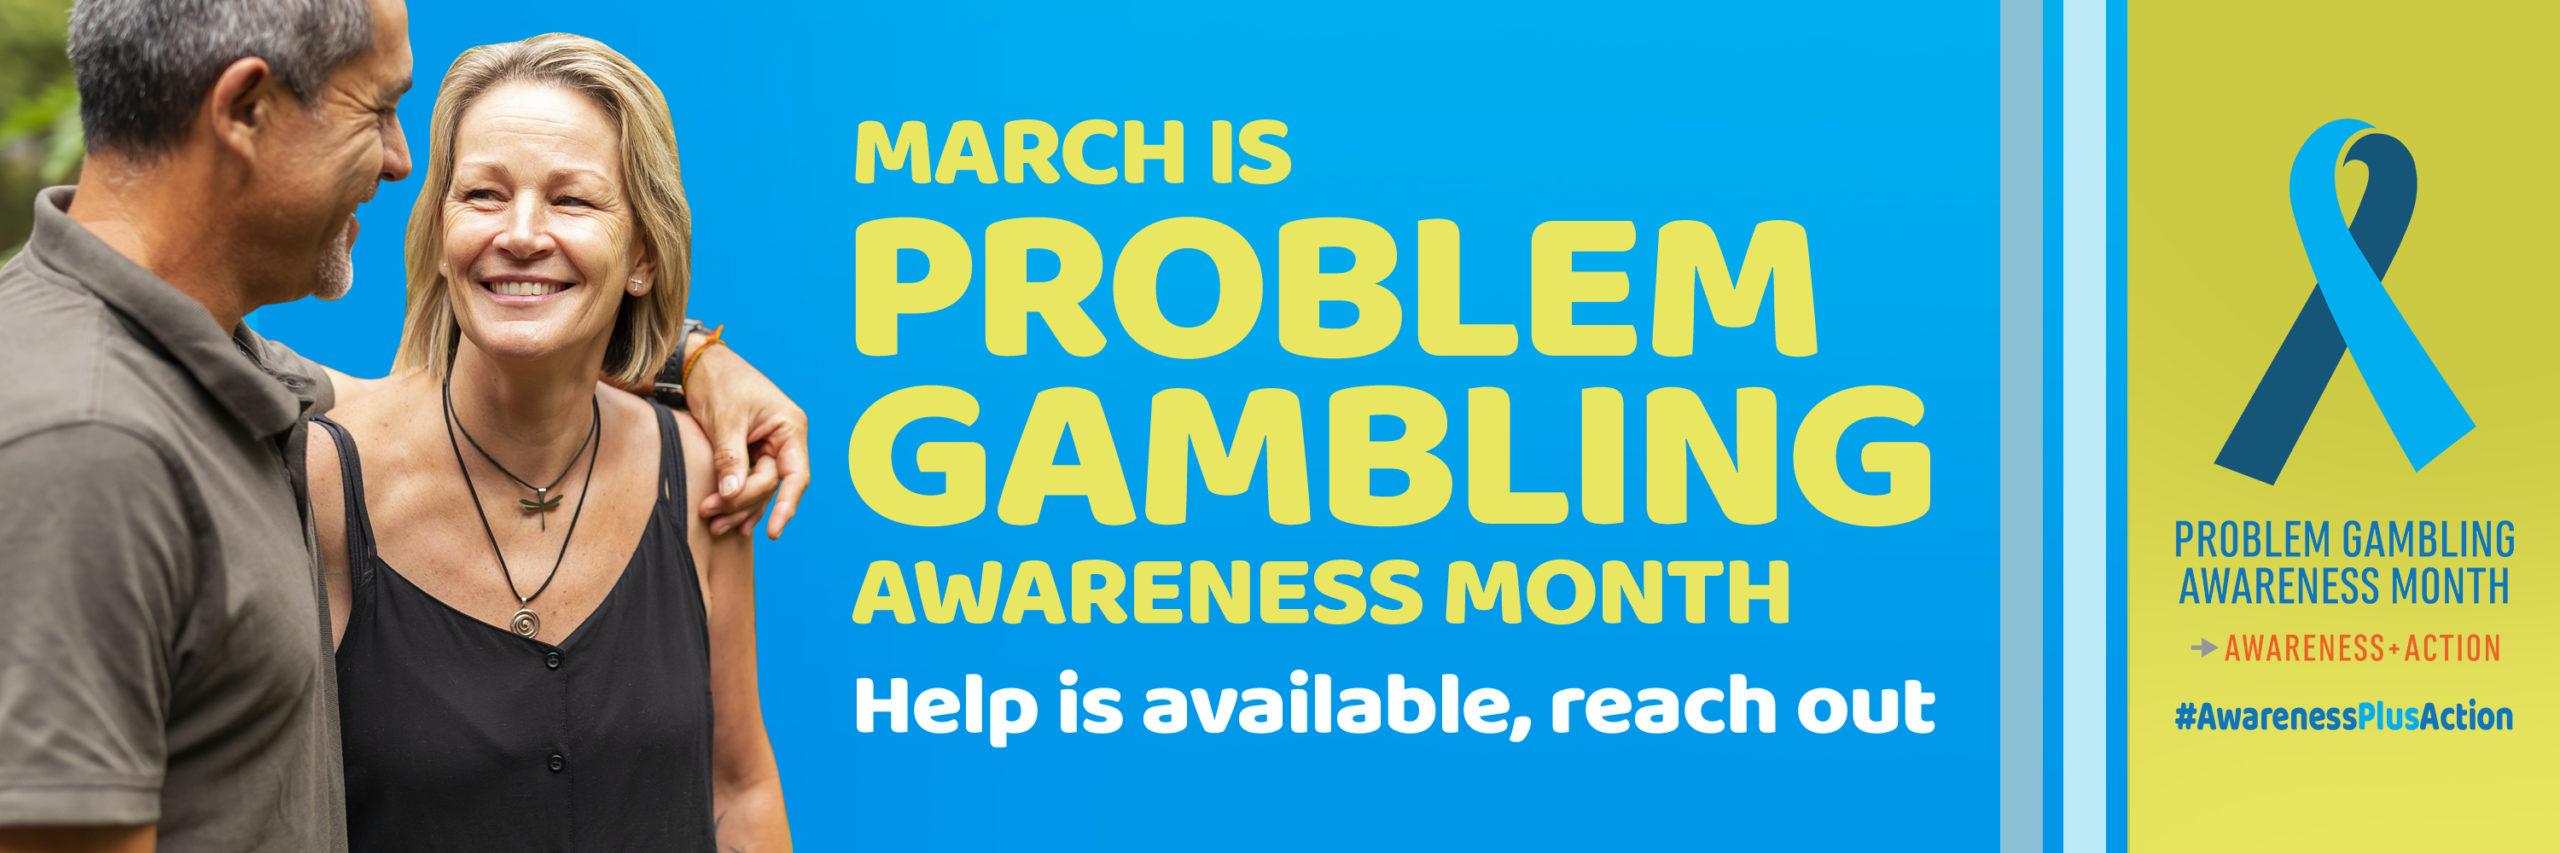 Problem Gambling Awereness Month Banner